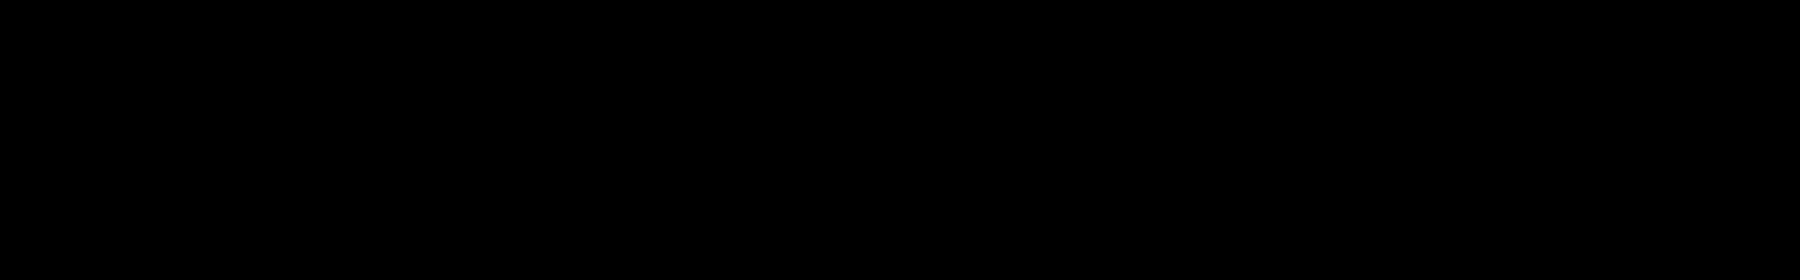 Dub Techno Planet audio waveform